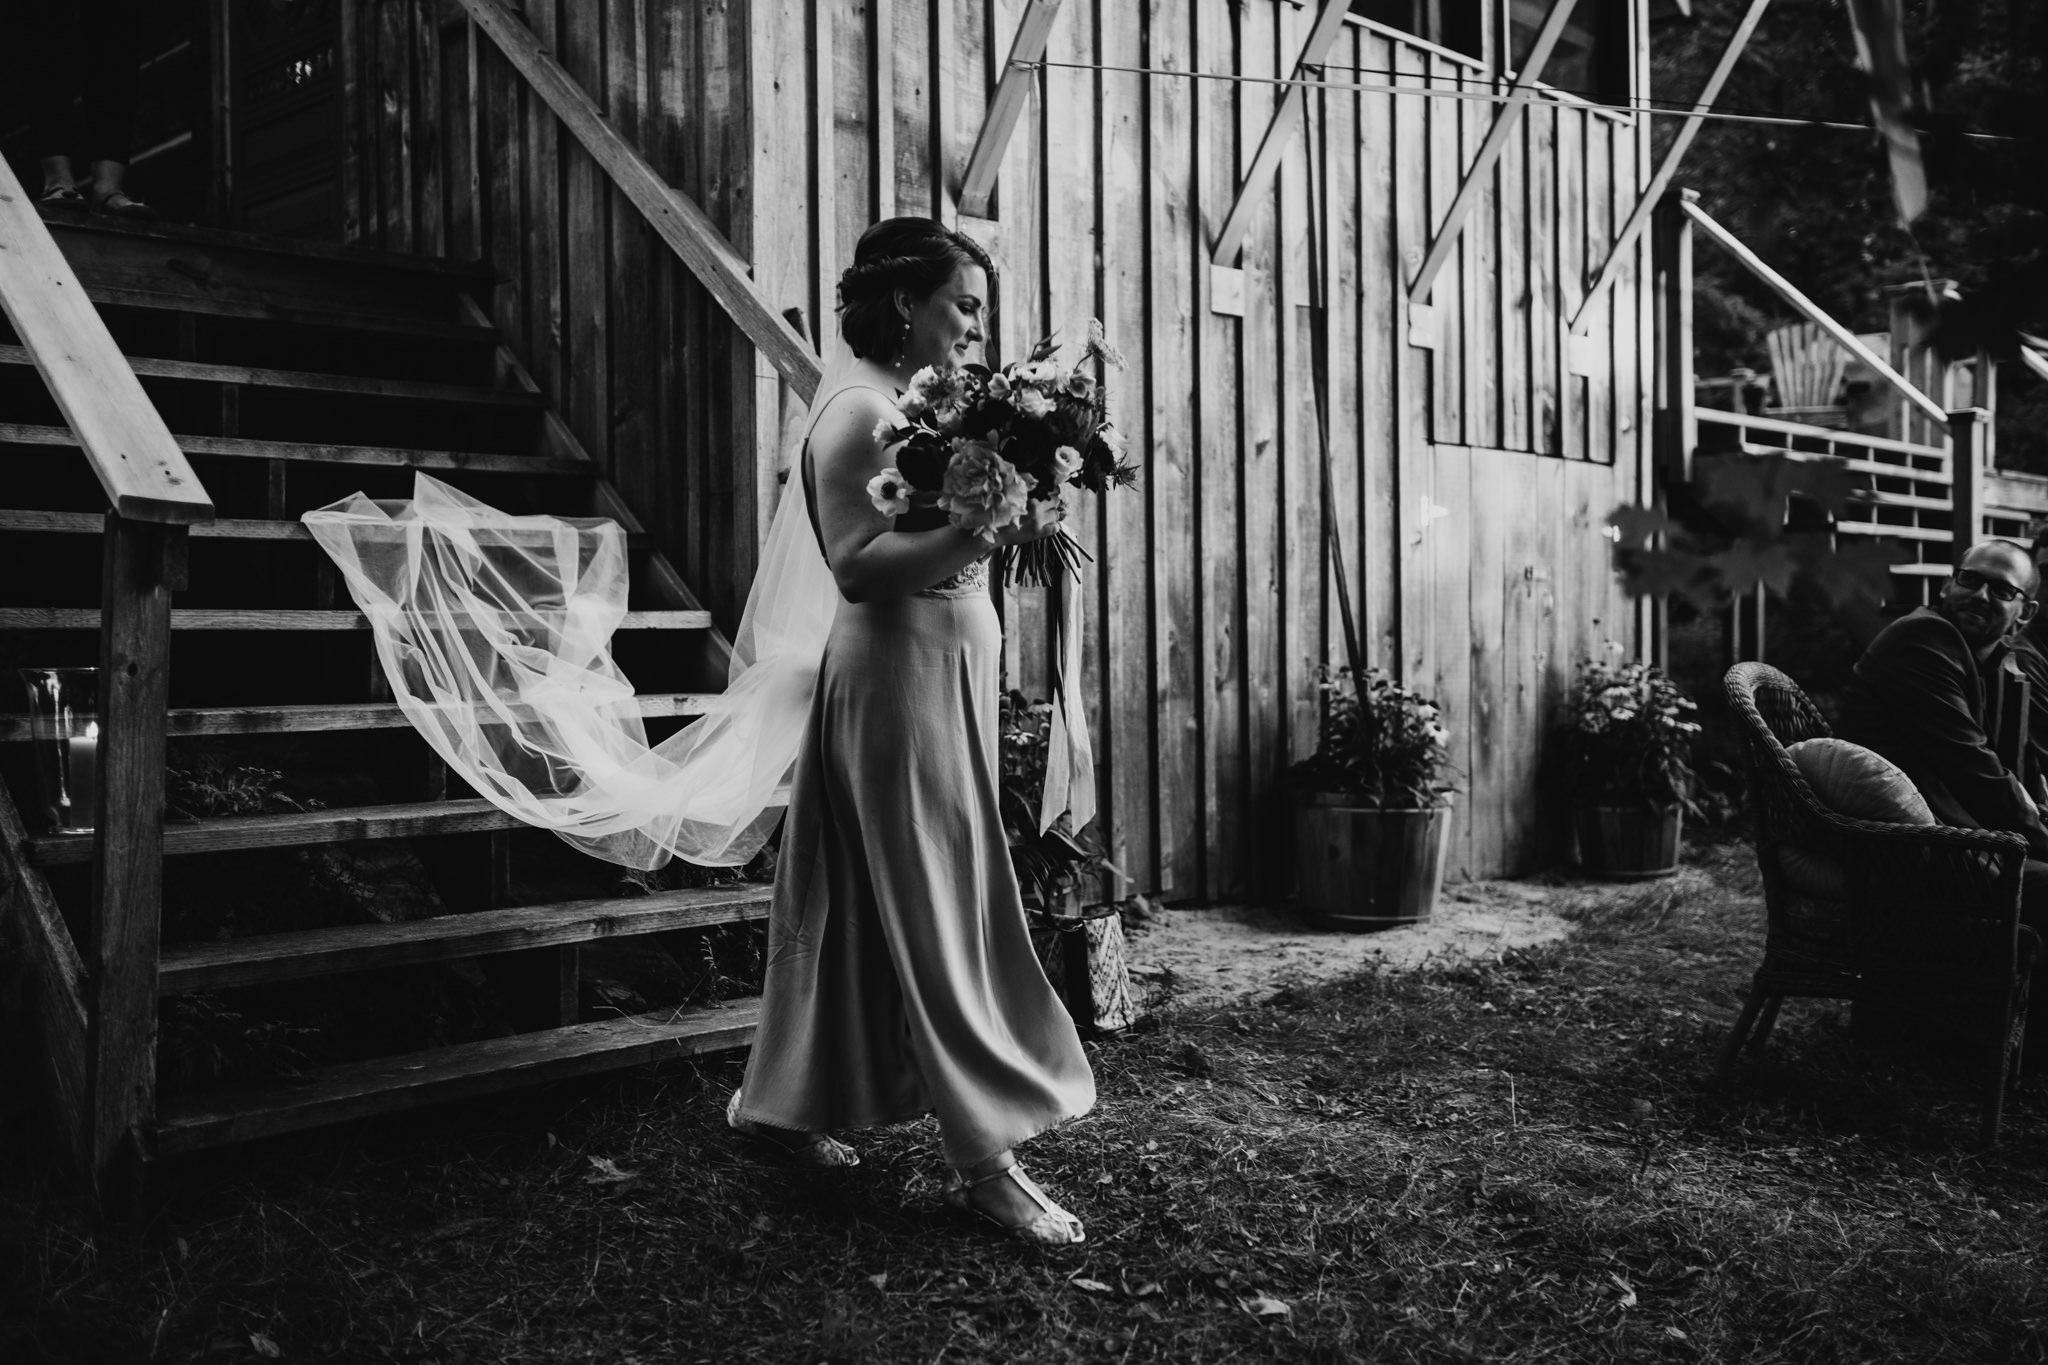 300-WEB-Jonathan-Kuhn-Photography-Taylor-Noah-Wedding-1438.jpg